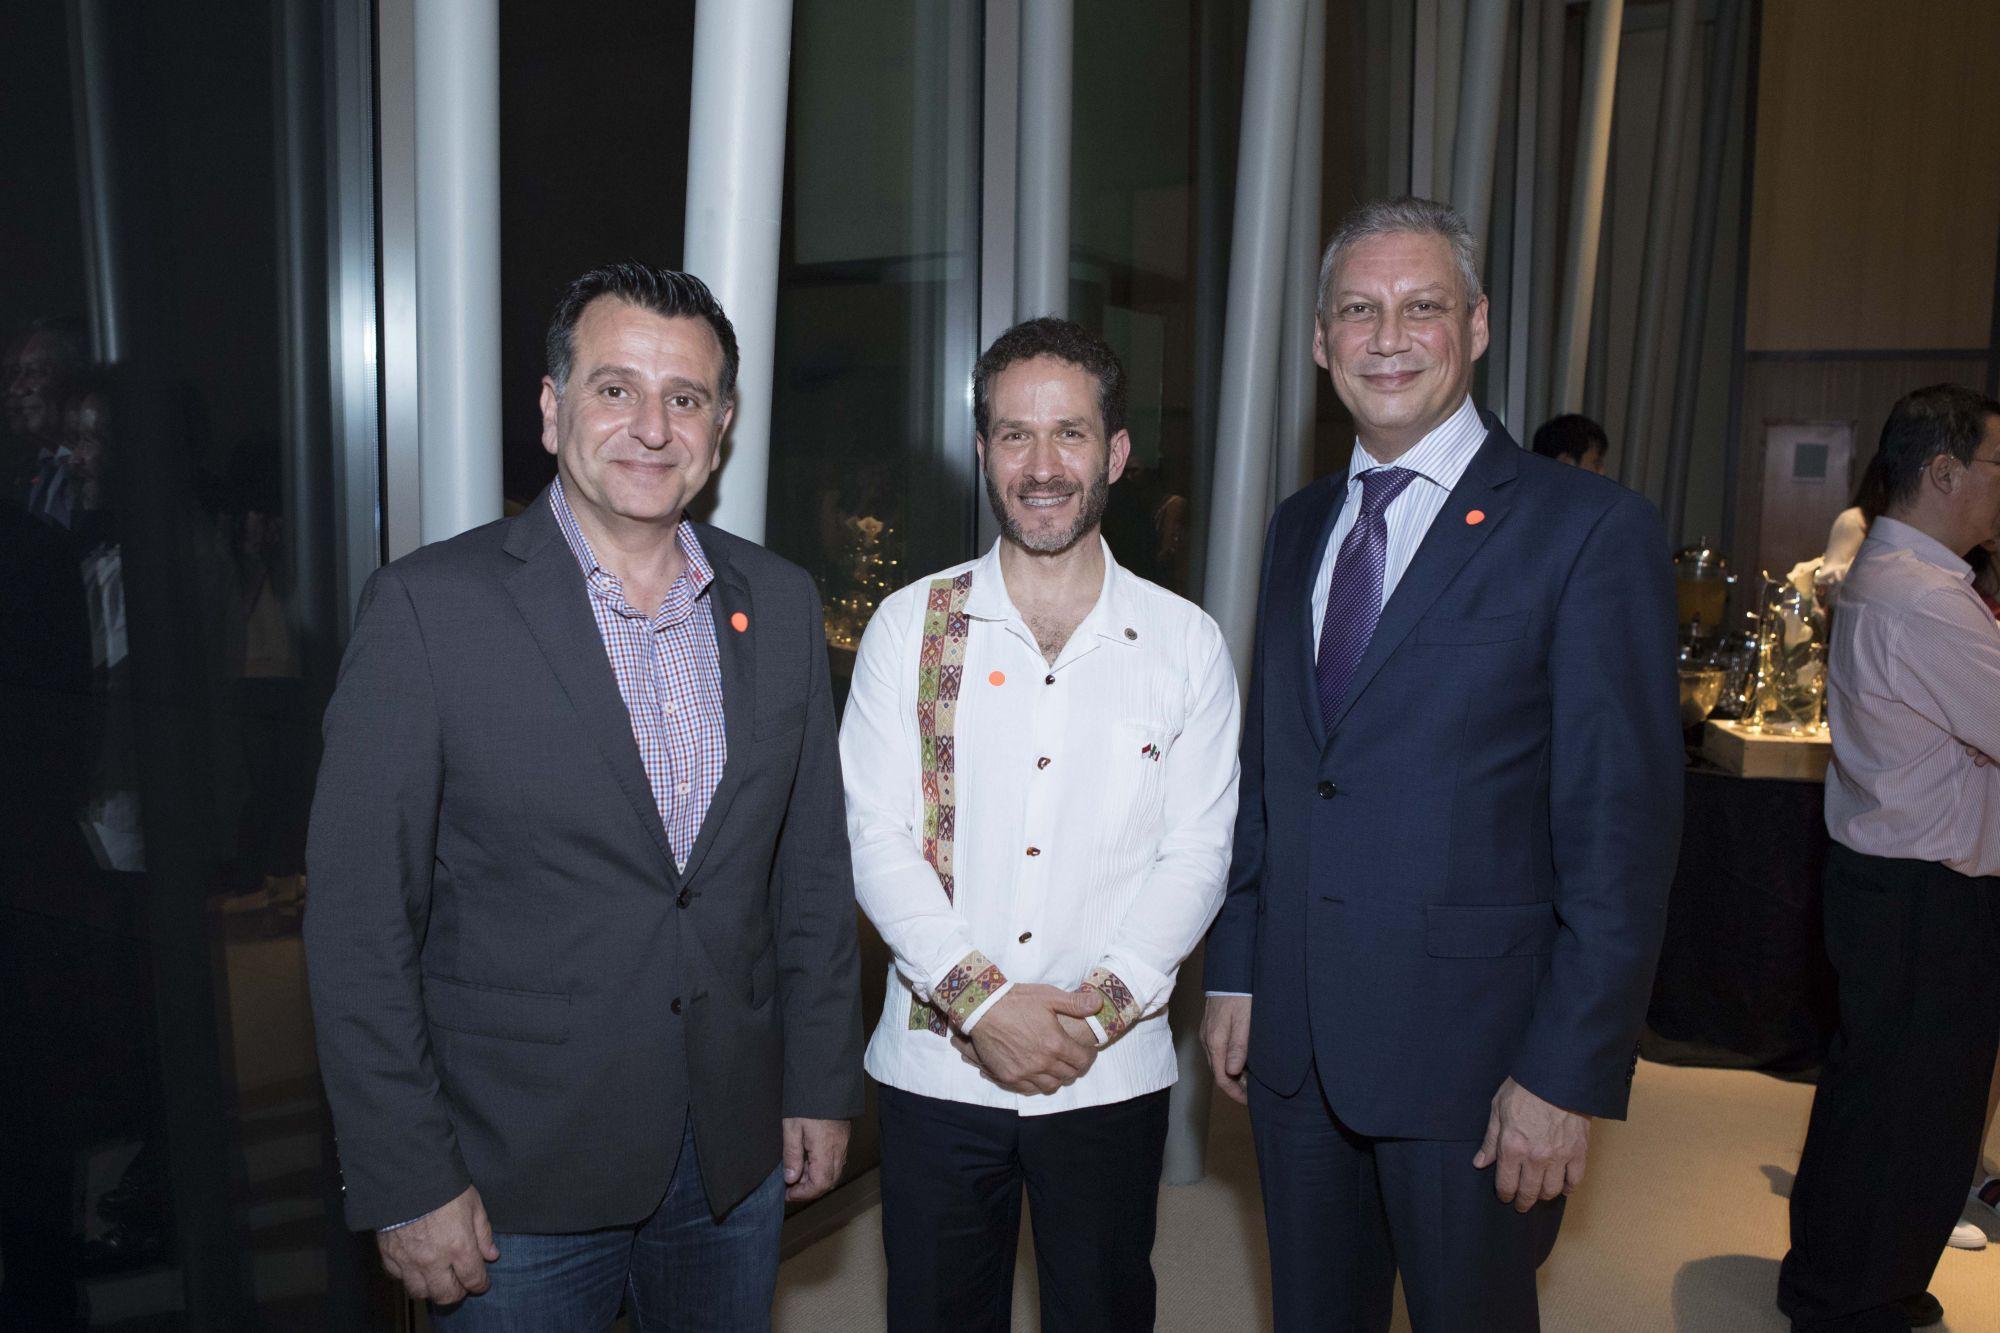 Nathan Wolf Lustbader, Mohamed Ahmed Fathi Abulkheir